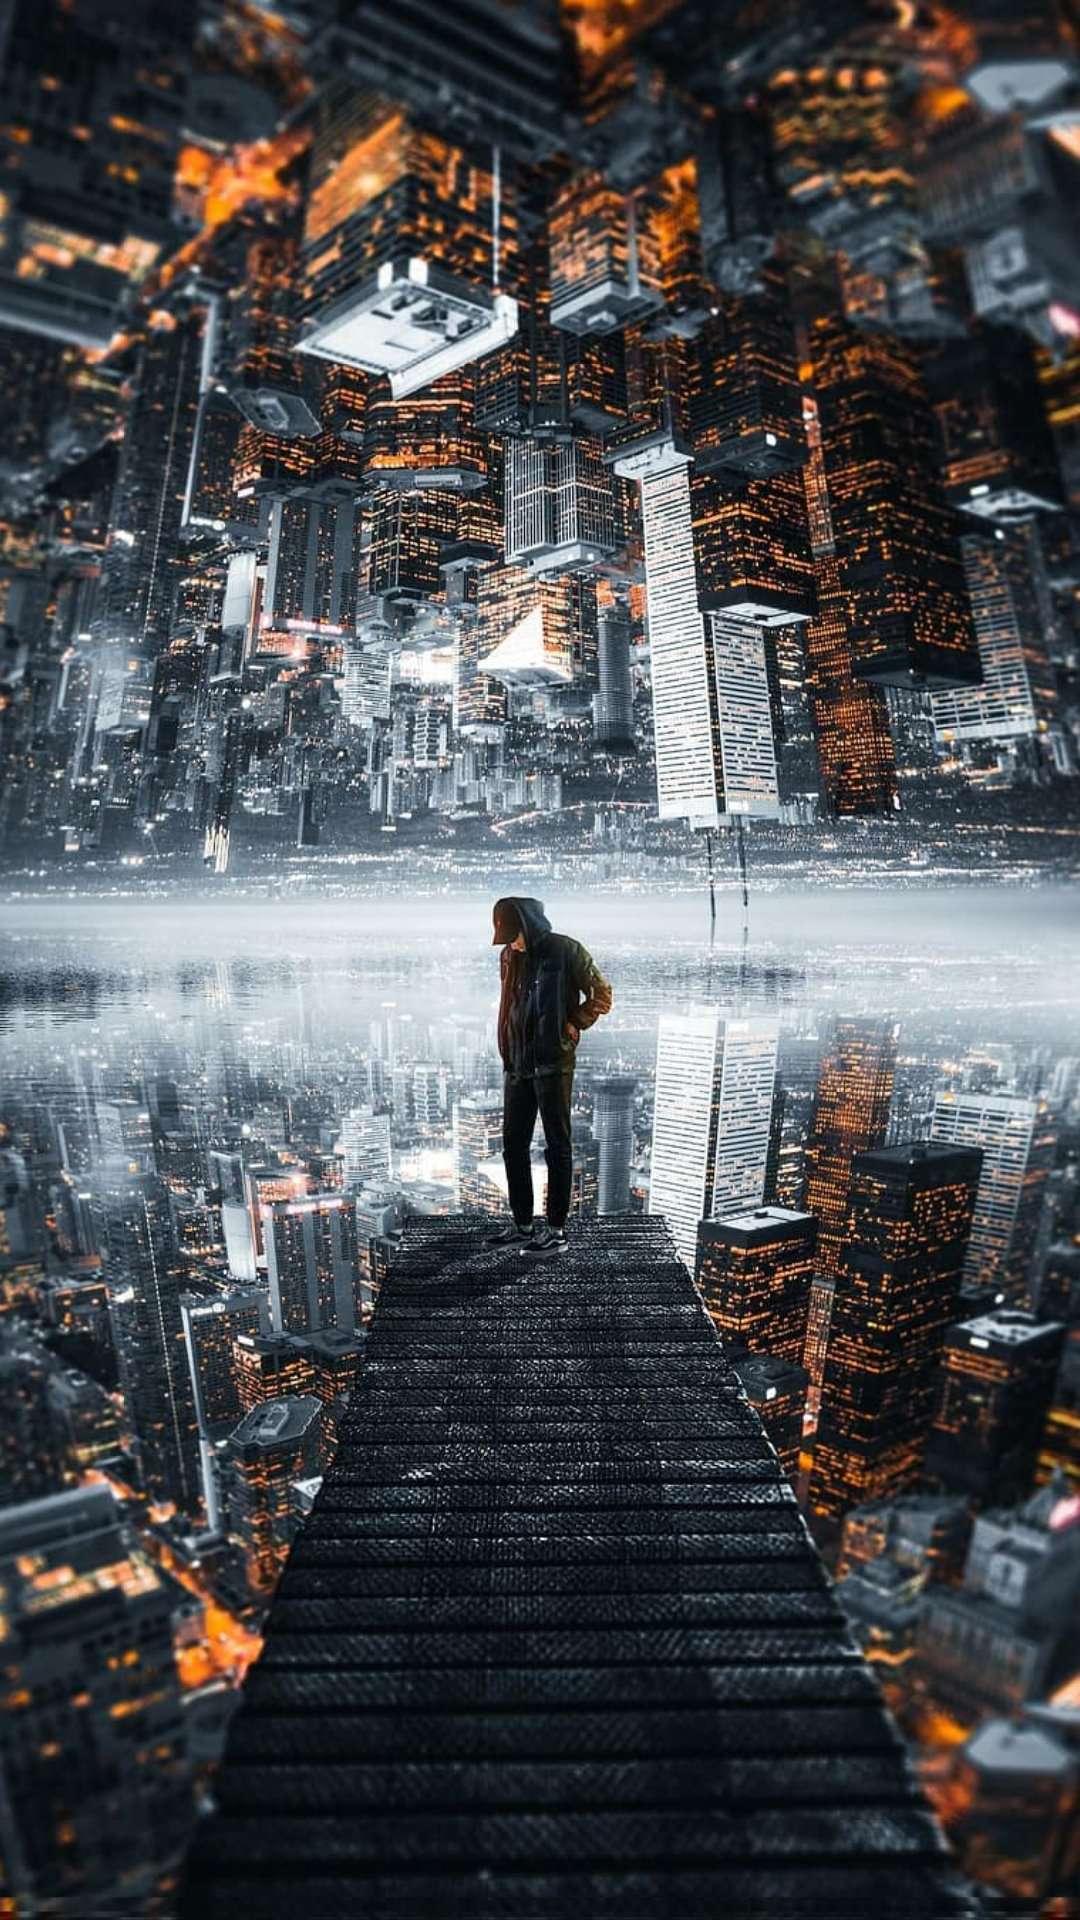 Man and City Wallpaper